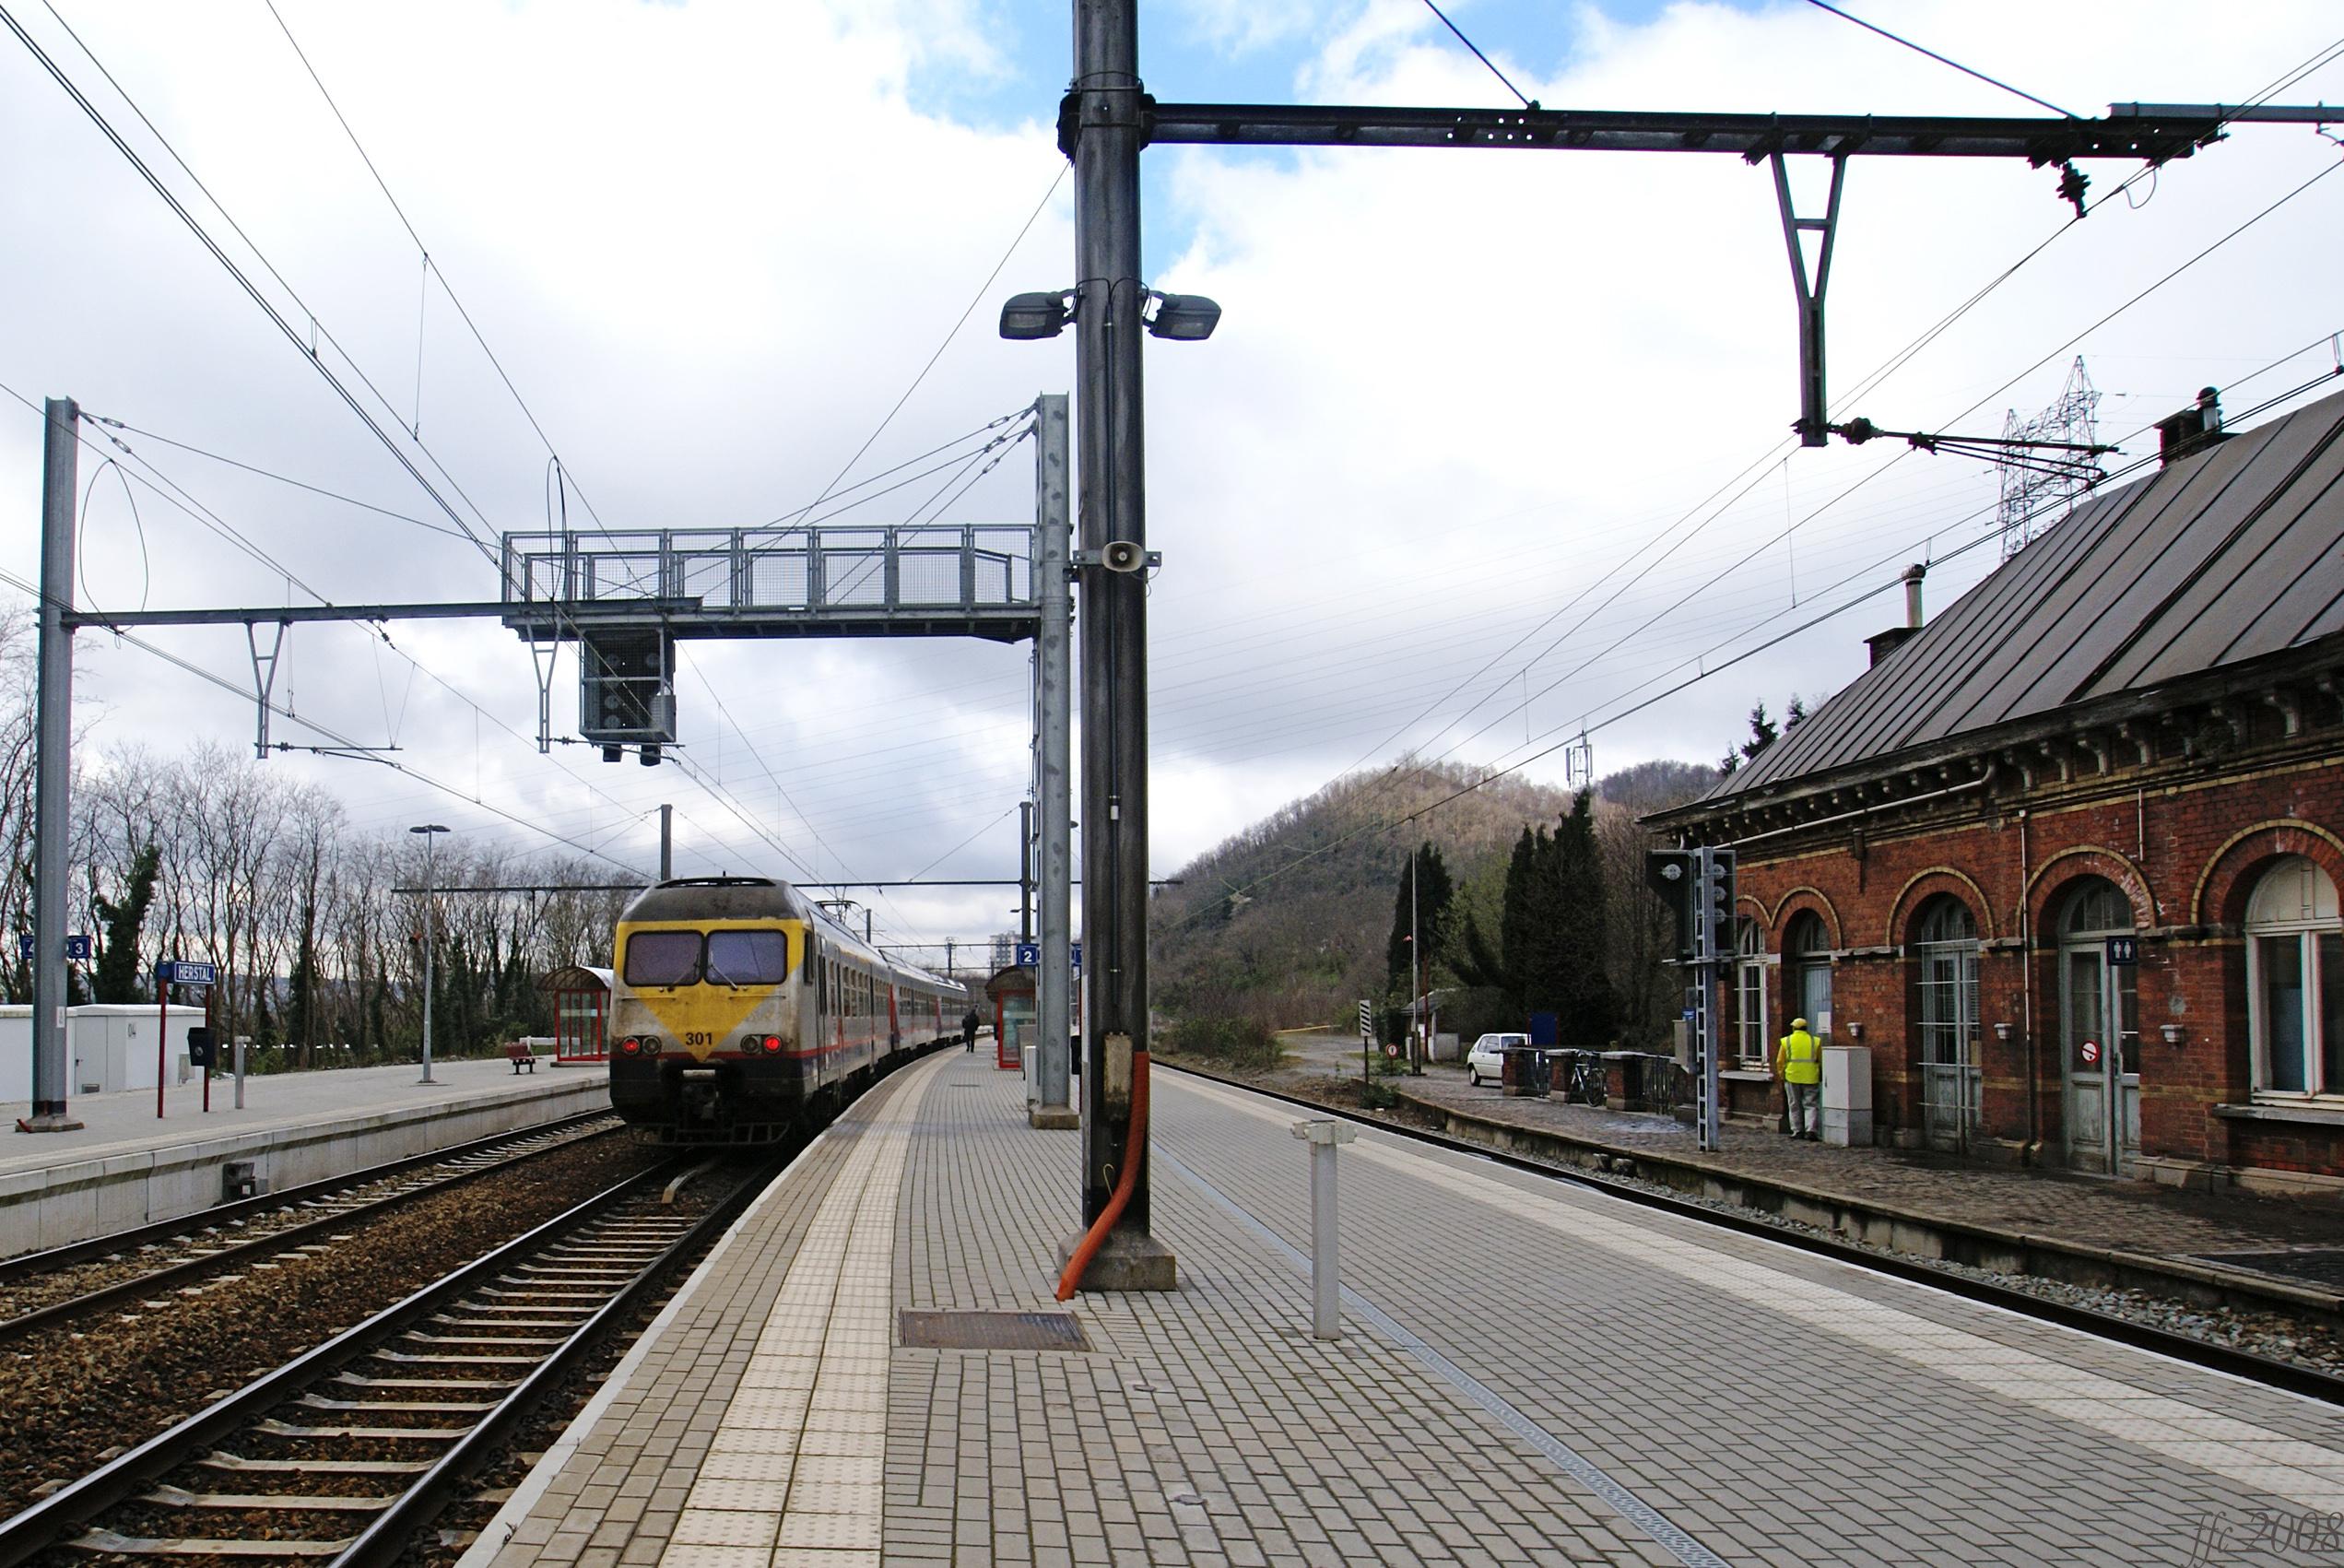 Gare de herstal wikiwand for Garage de la gare bretigny